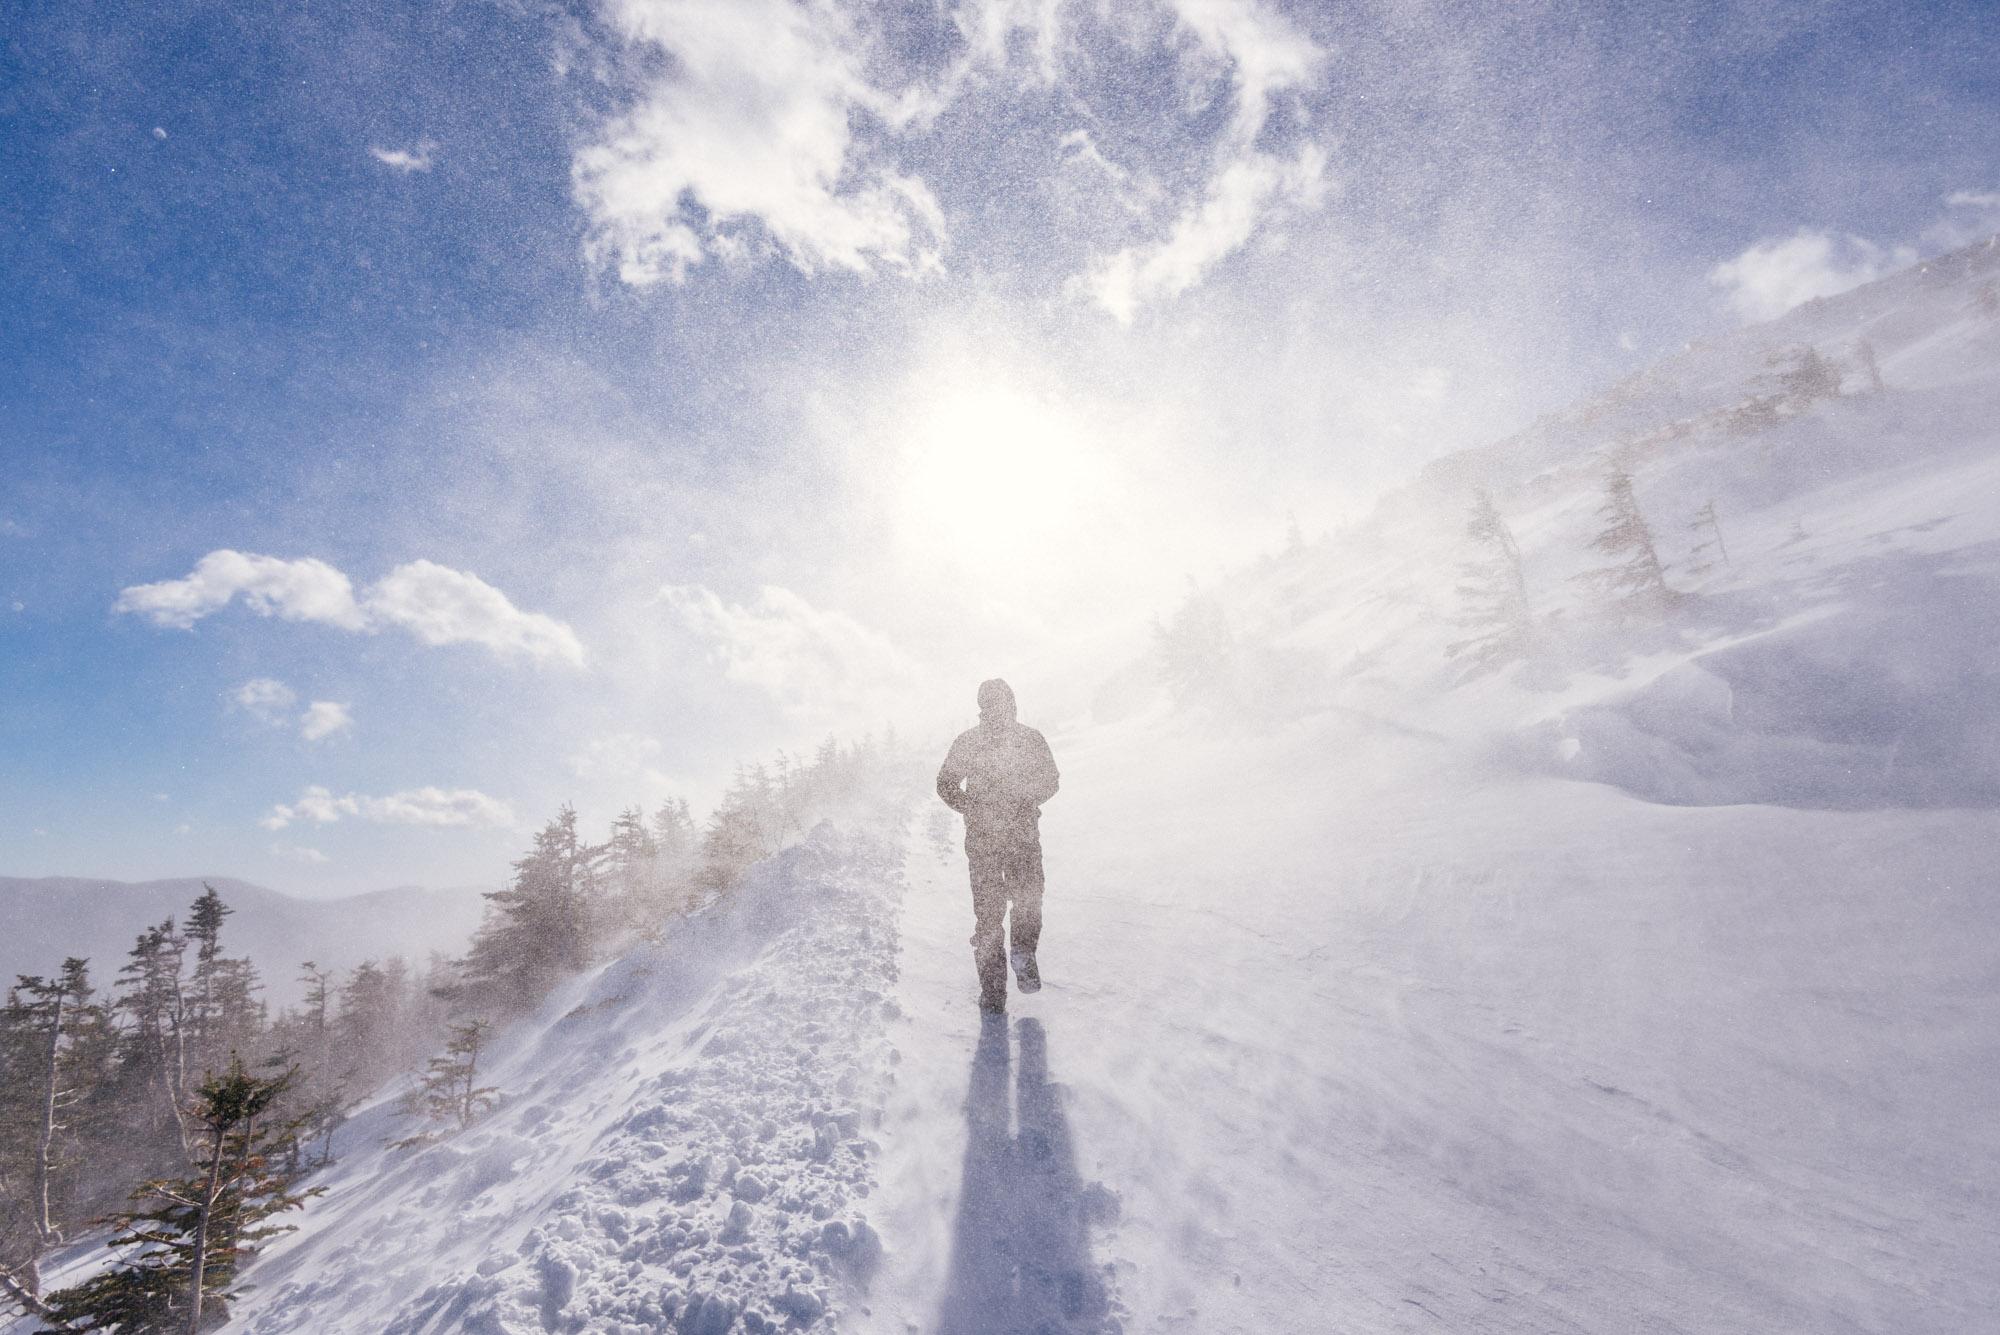 jeffontheroad-travel-new-hampshire-mount-washington-snowcoach-10.JPG